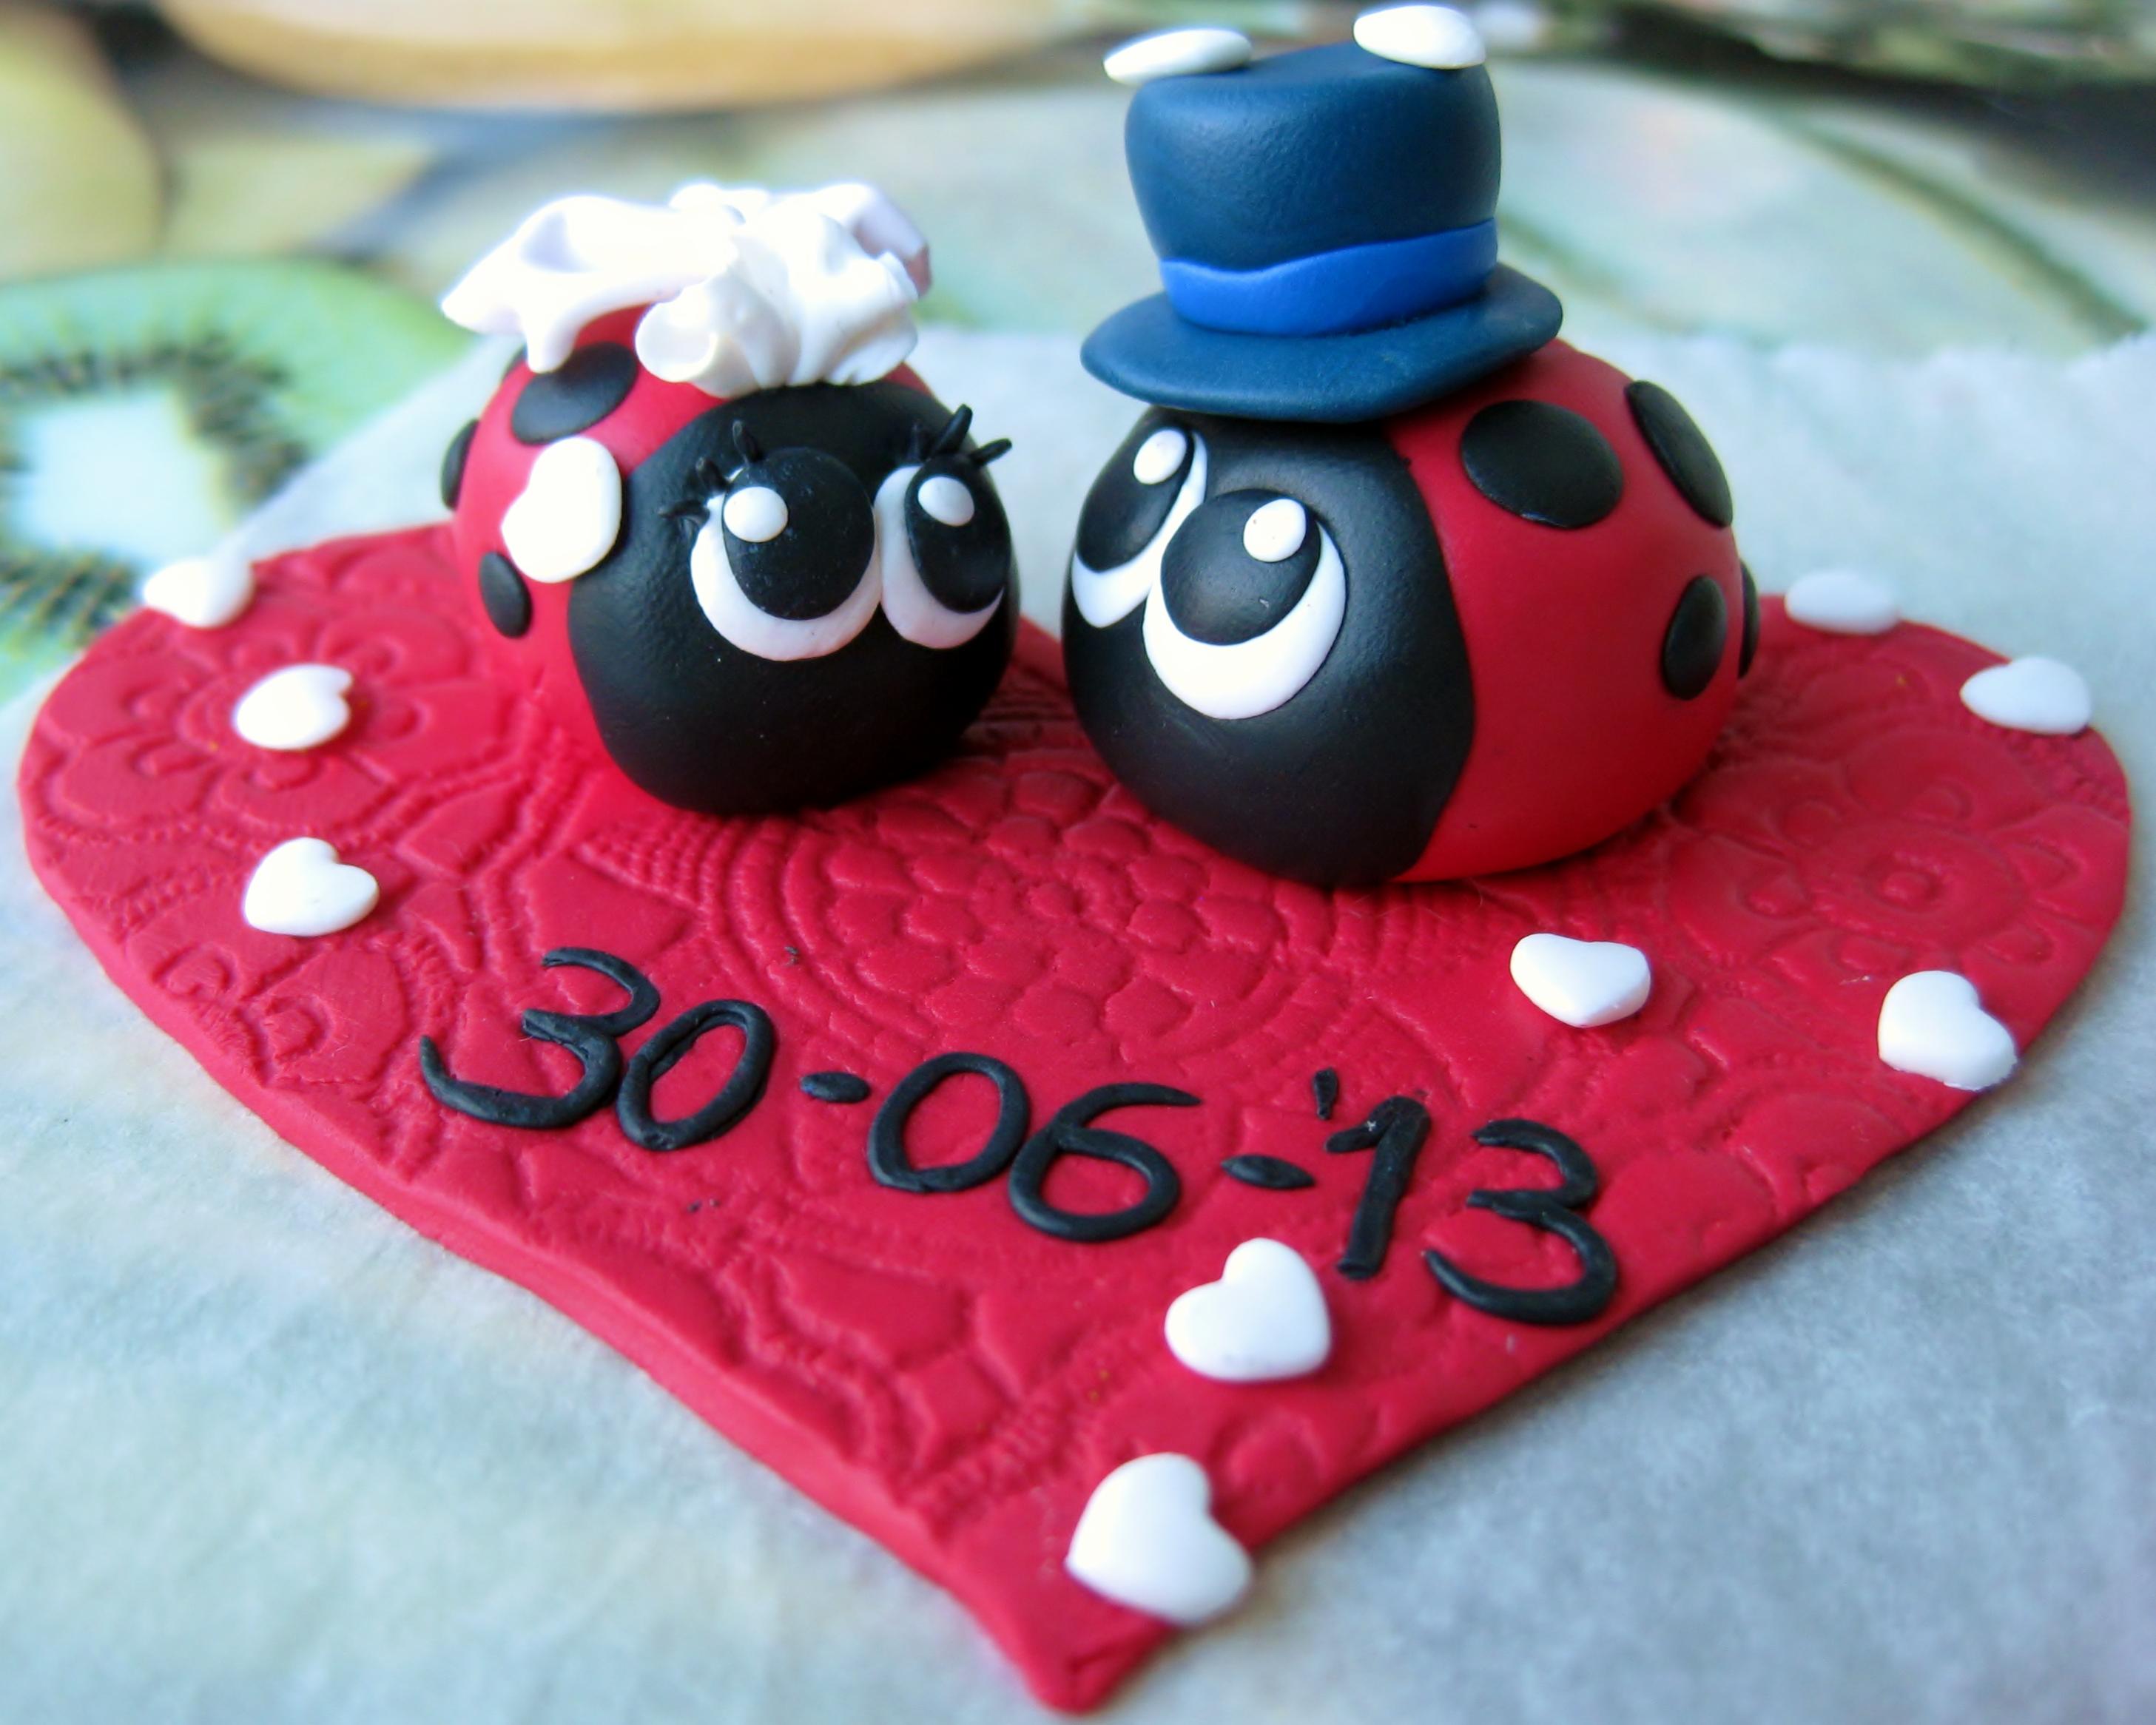 bomboniere matrimonio idee regalo : Bomboniere Per Matrimonio Idee Regalo Vendita Online Share The ...